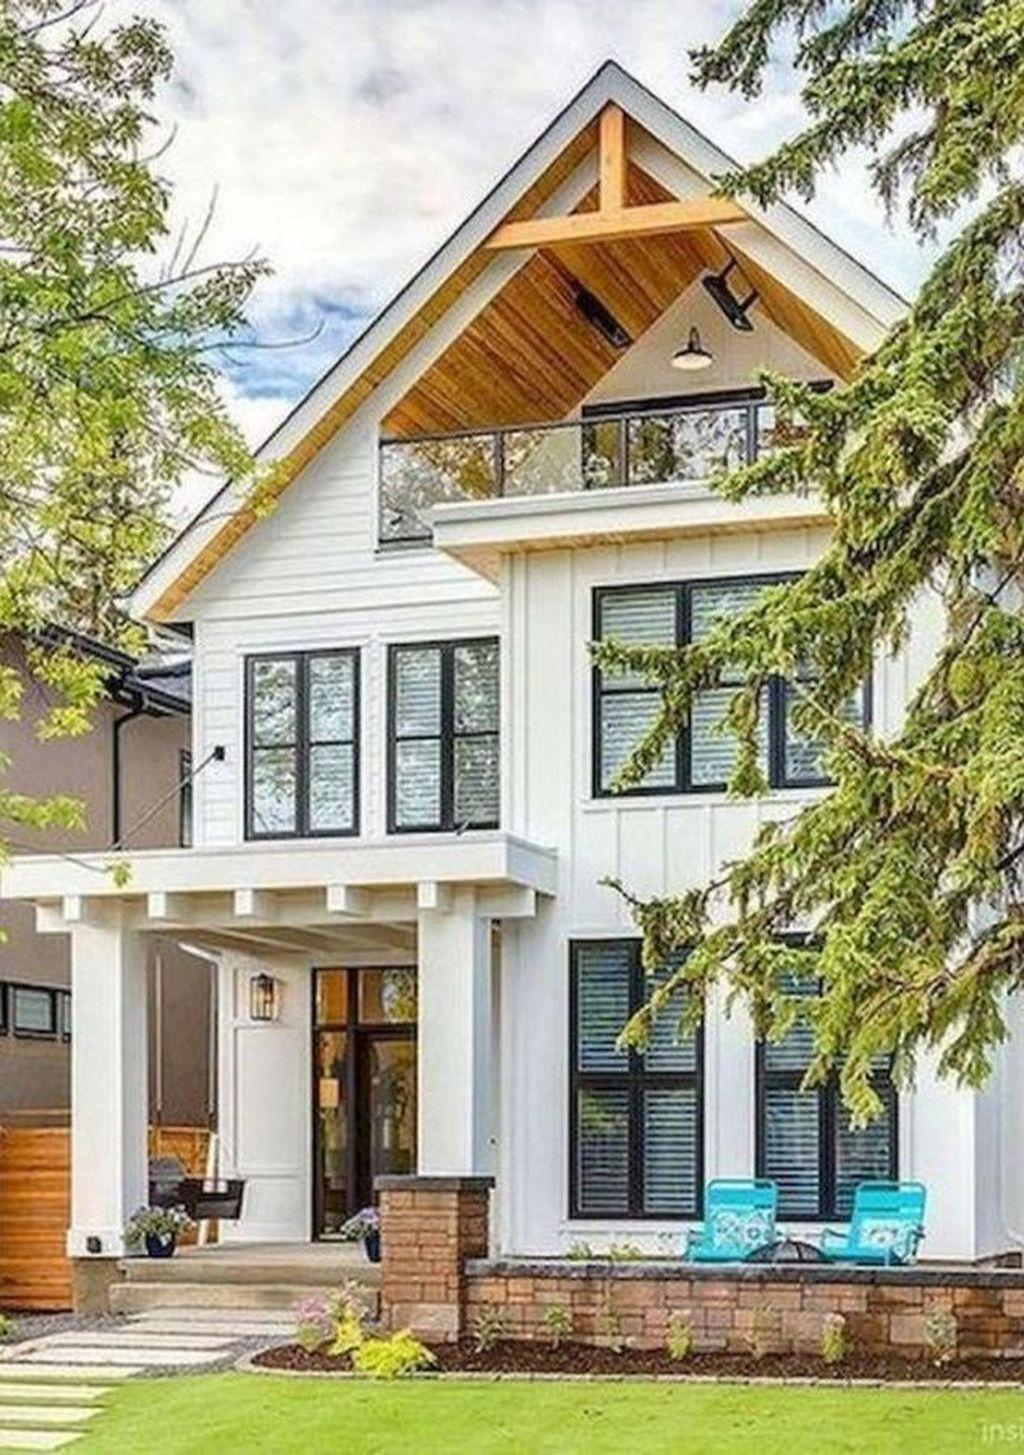 Captivating Farmhouse Exterior House Design Ideas To Copy Right Now 33